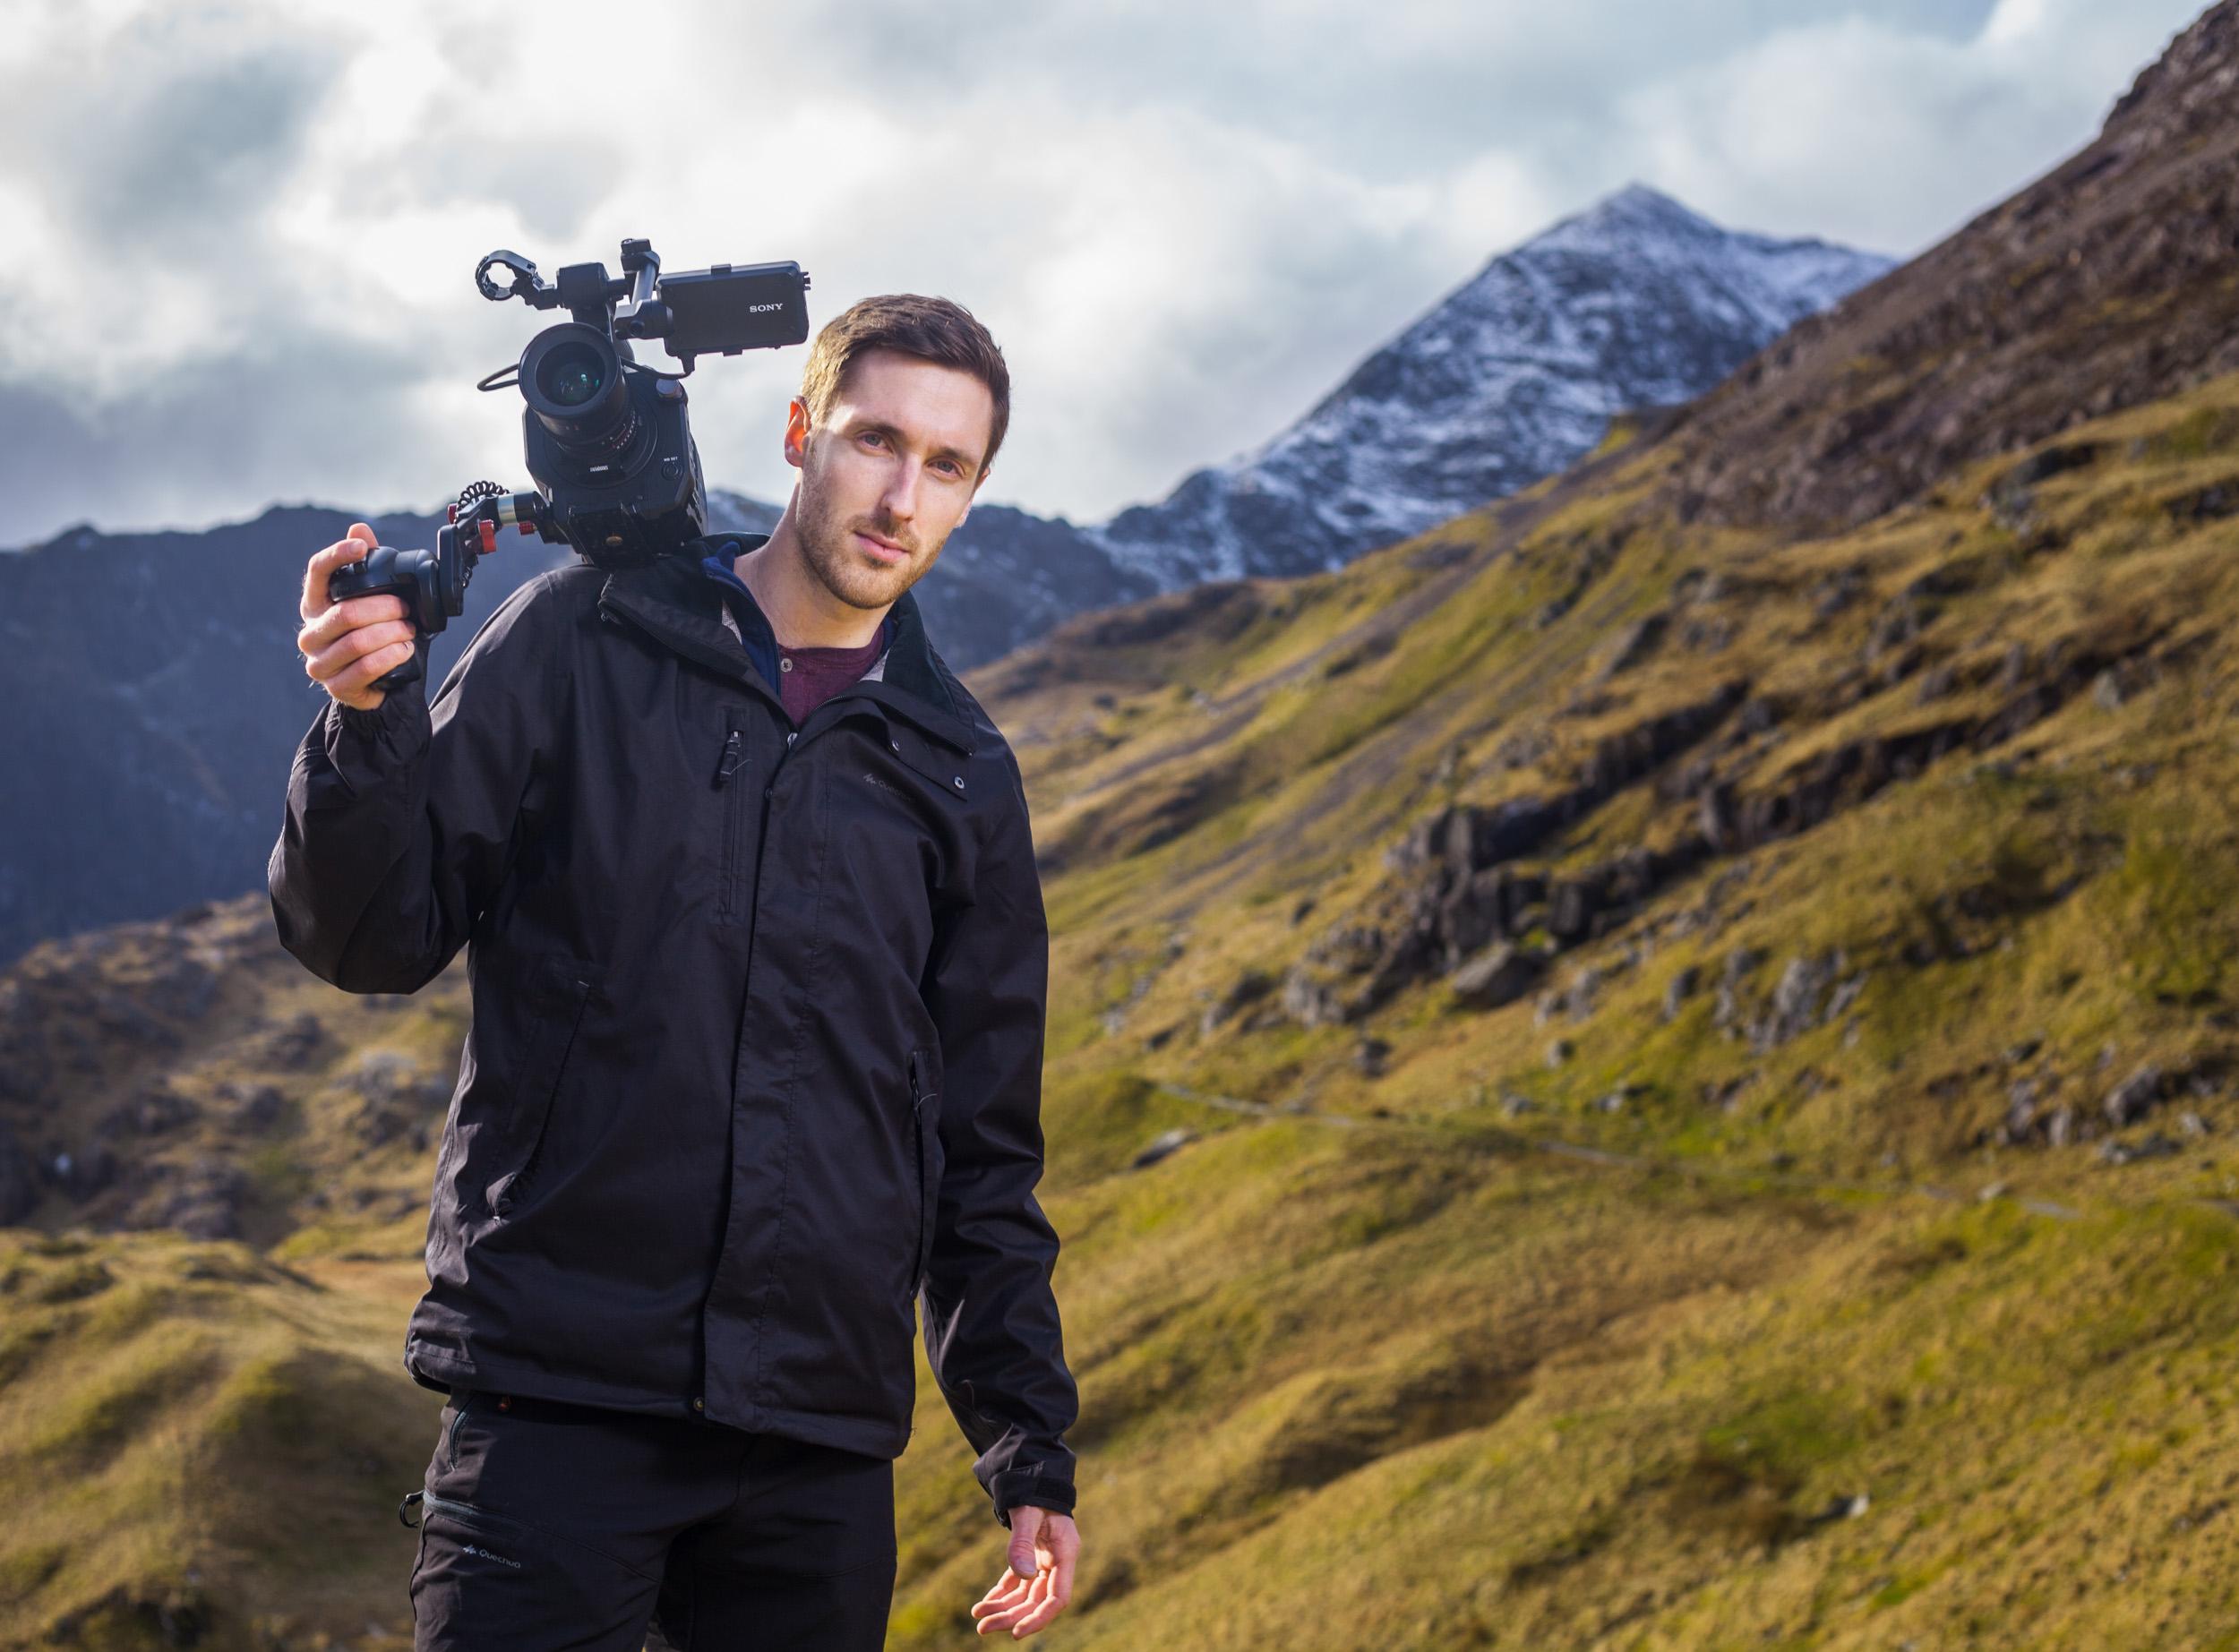 Manchester Camera Operator